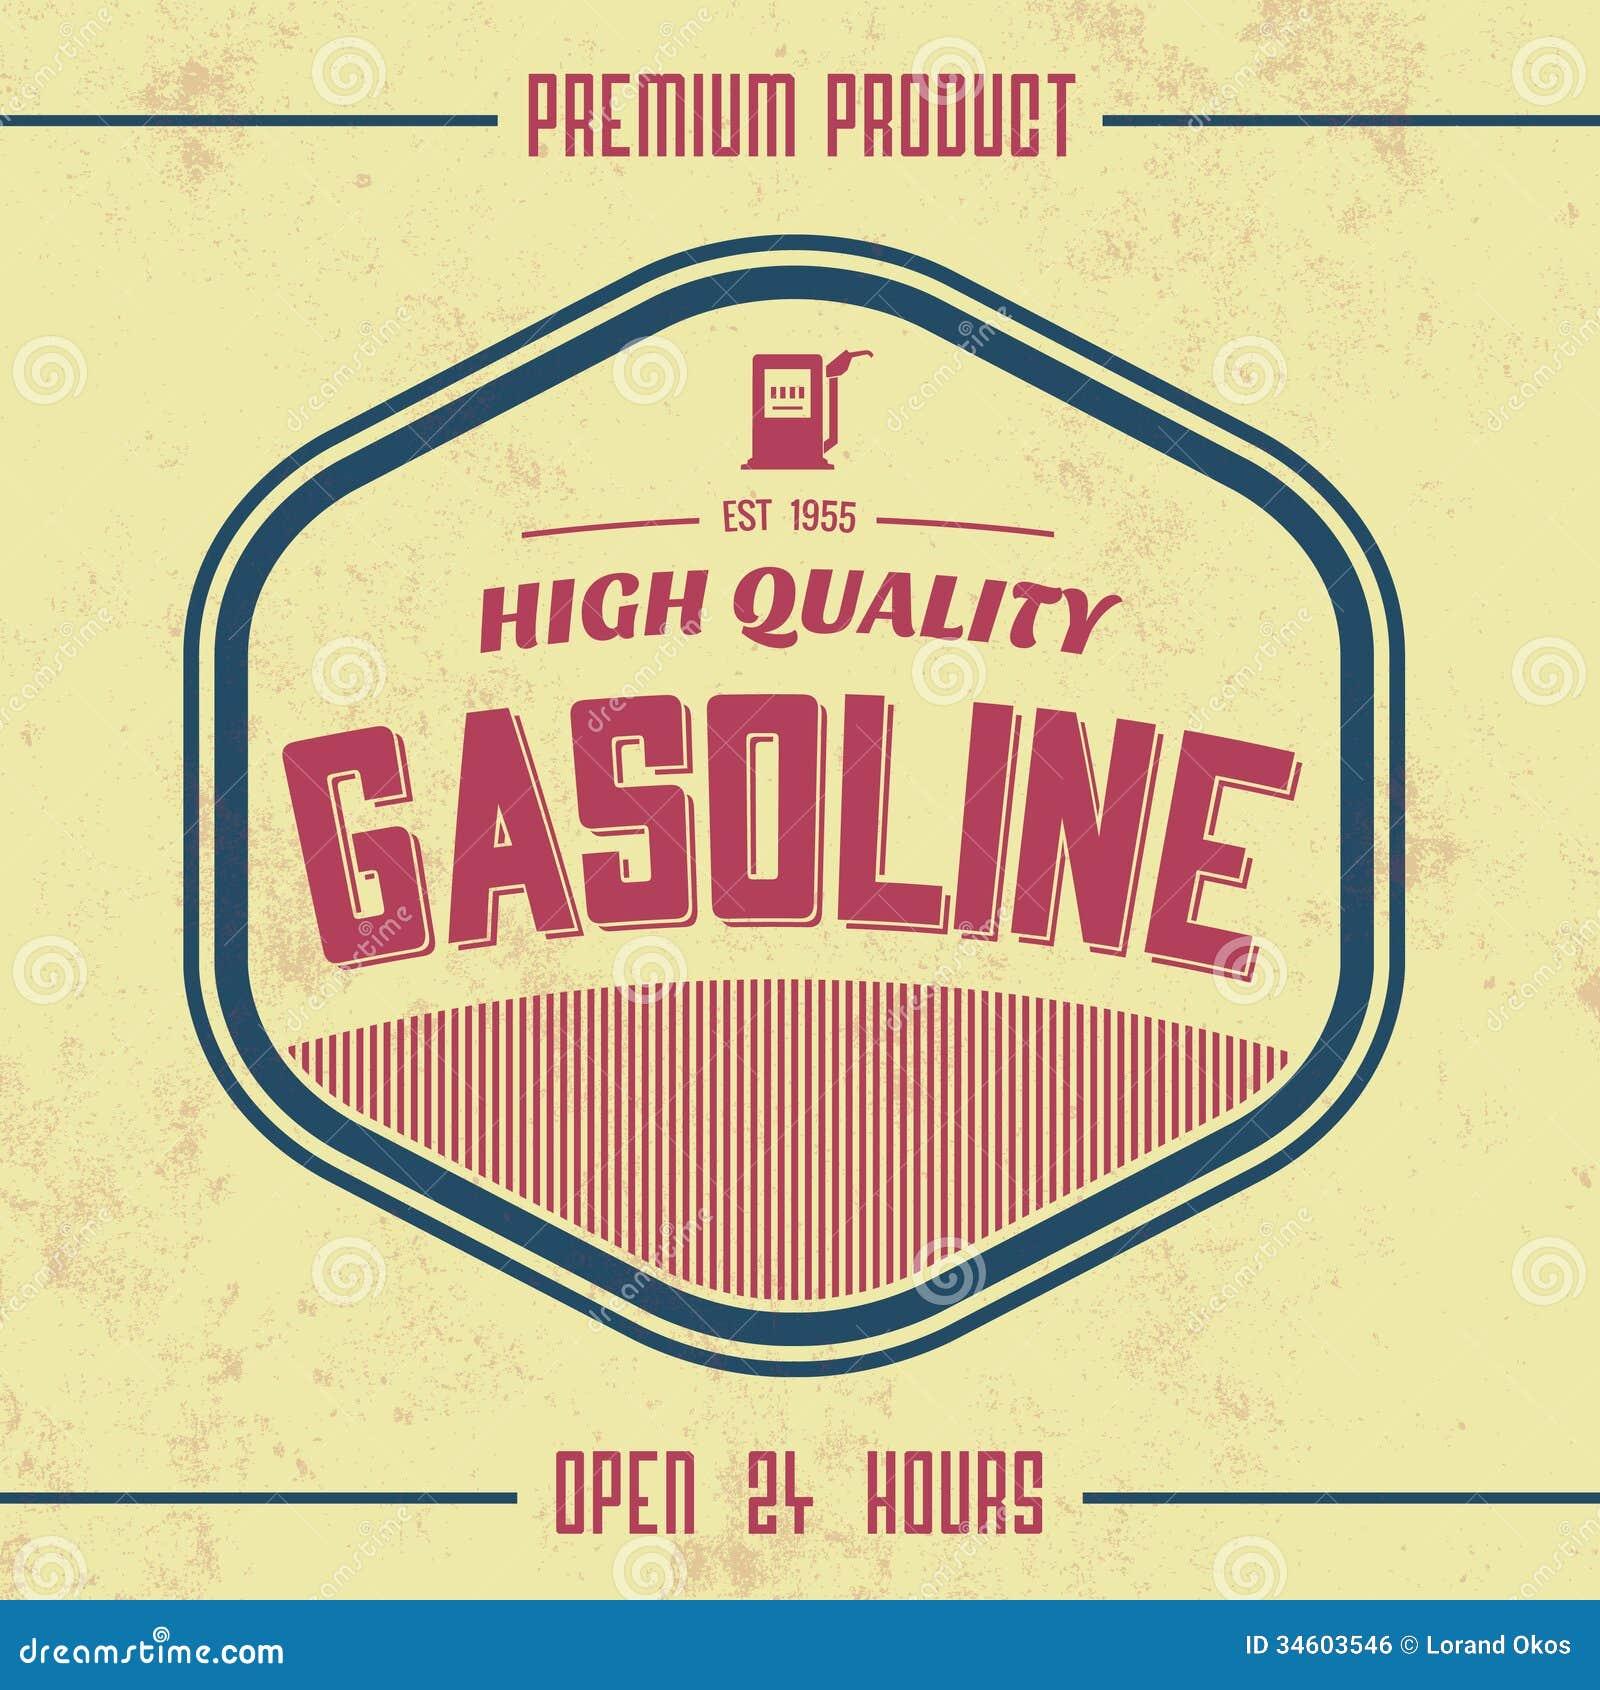 Vintage gasoline sign retro template stock vector image 34603546 vintage gasoline sign retro template pronofoot35fo Gallery